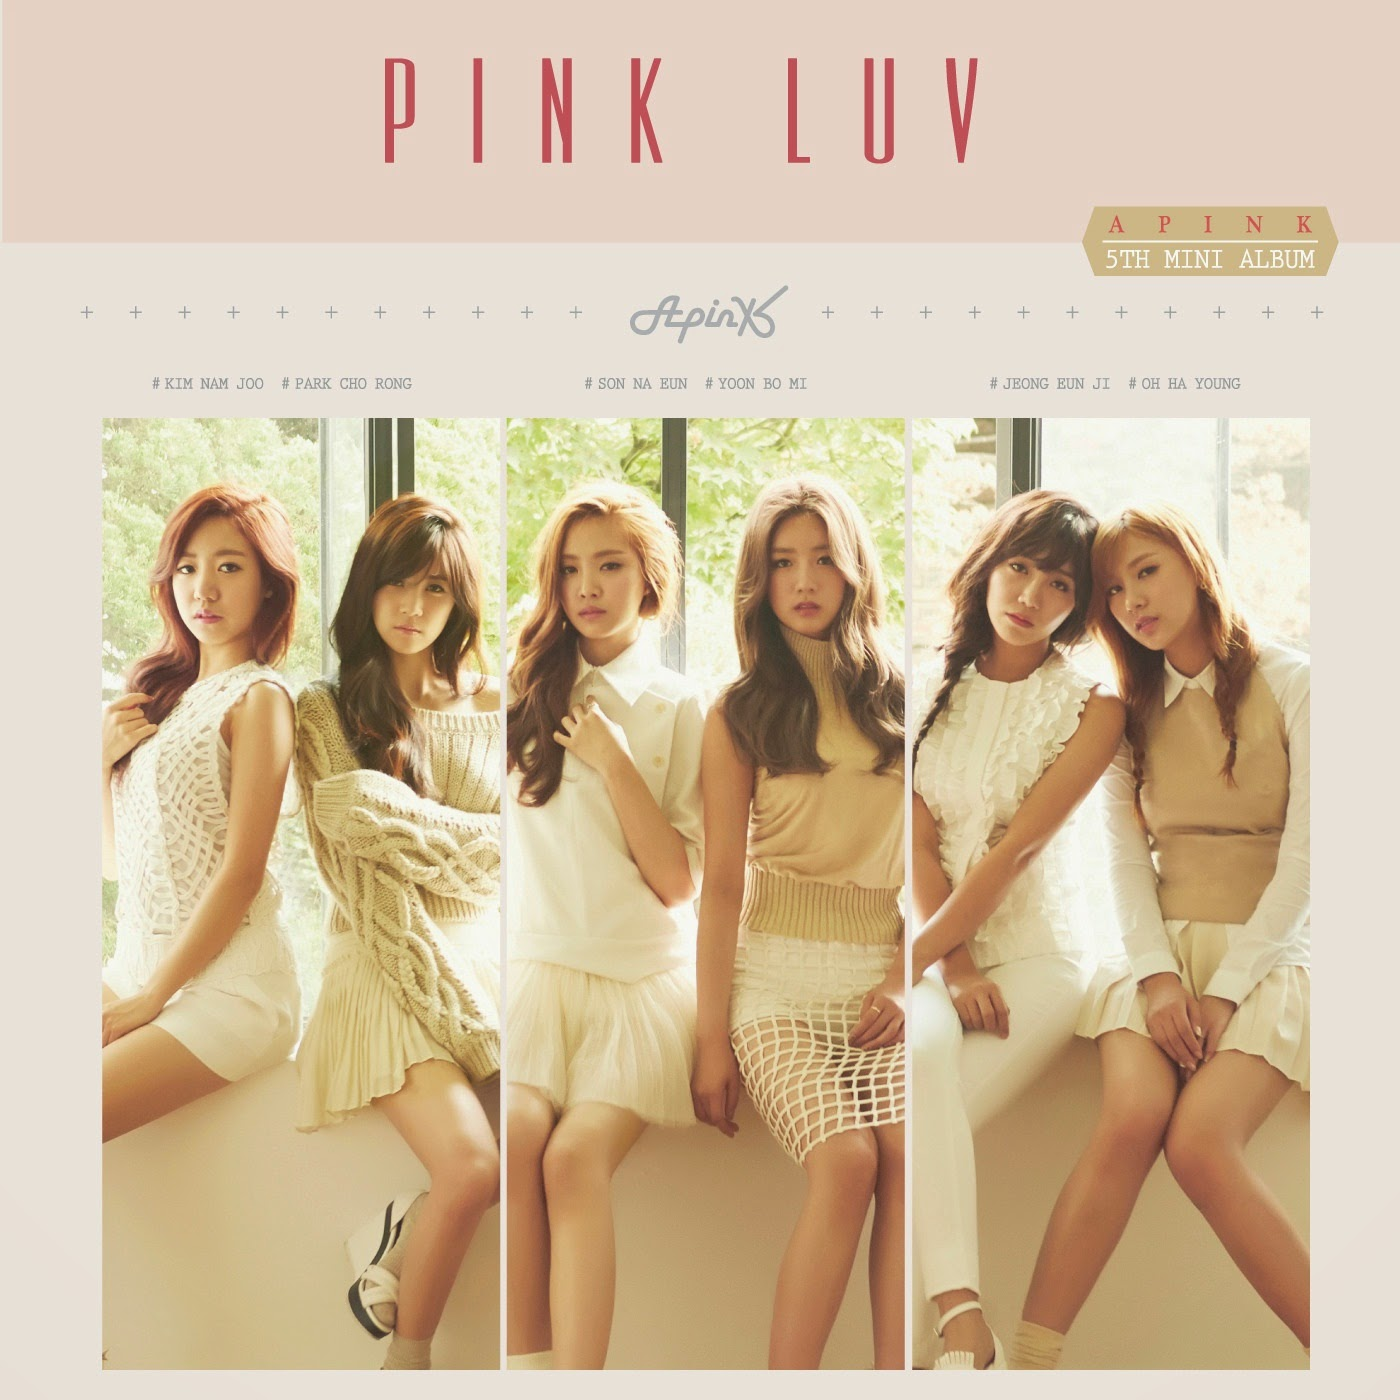 A Pink LUV lyrics cover